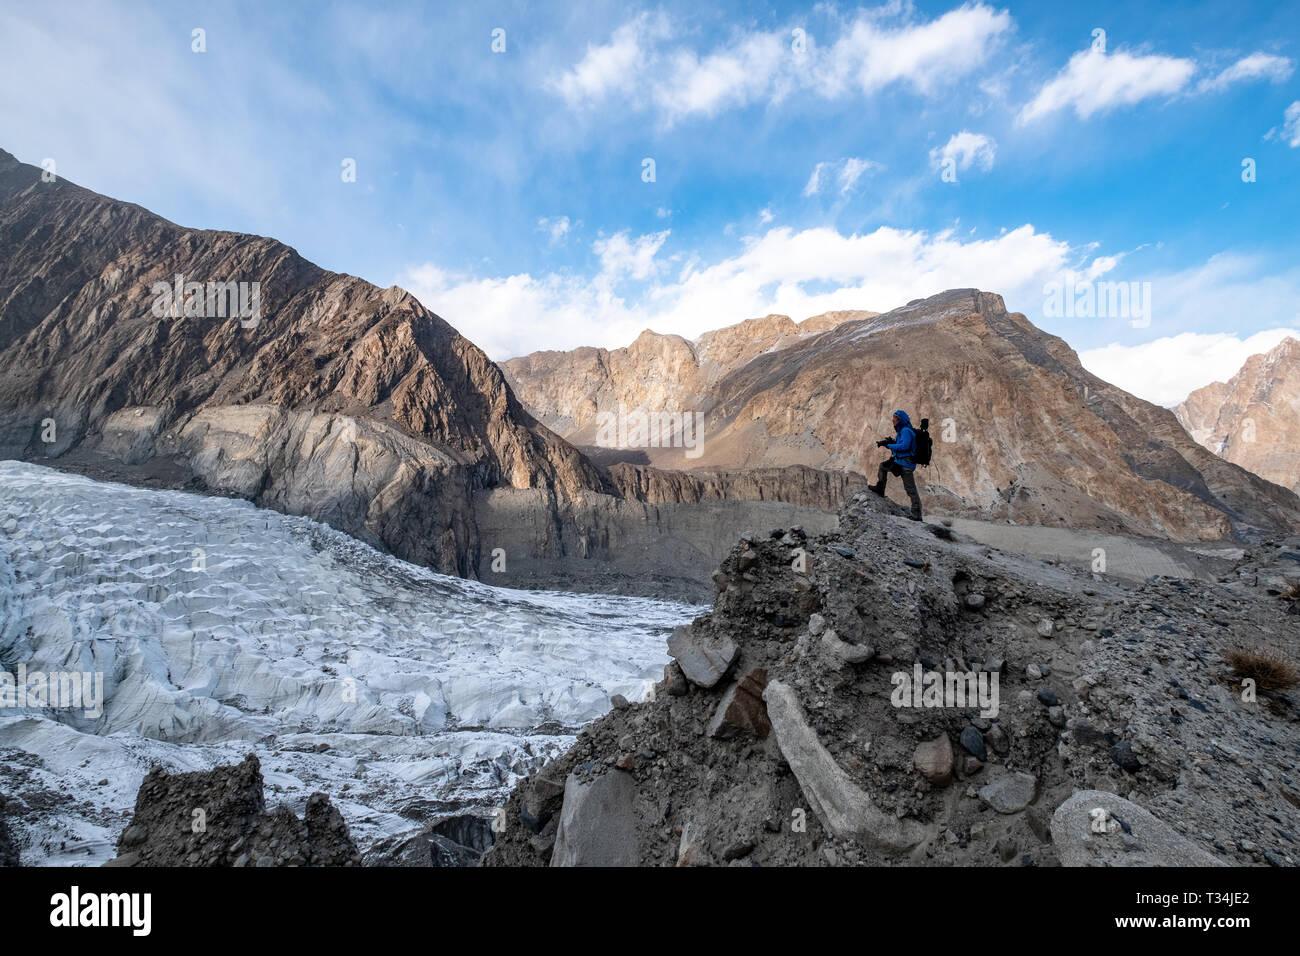 Man photographing the Passu Glacier, Gilgit-Baltistan, Pakistan - Stock Image